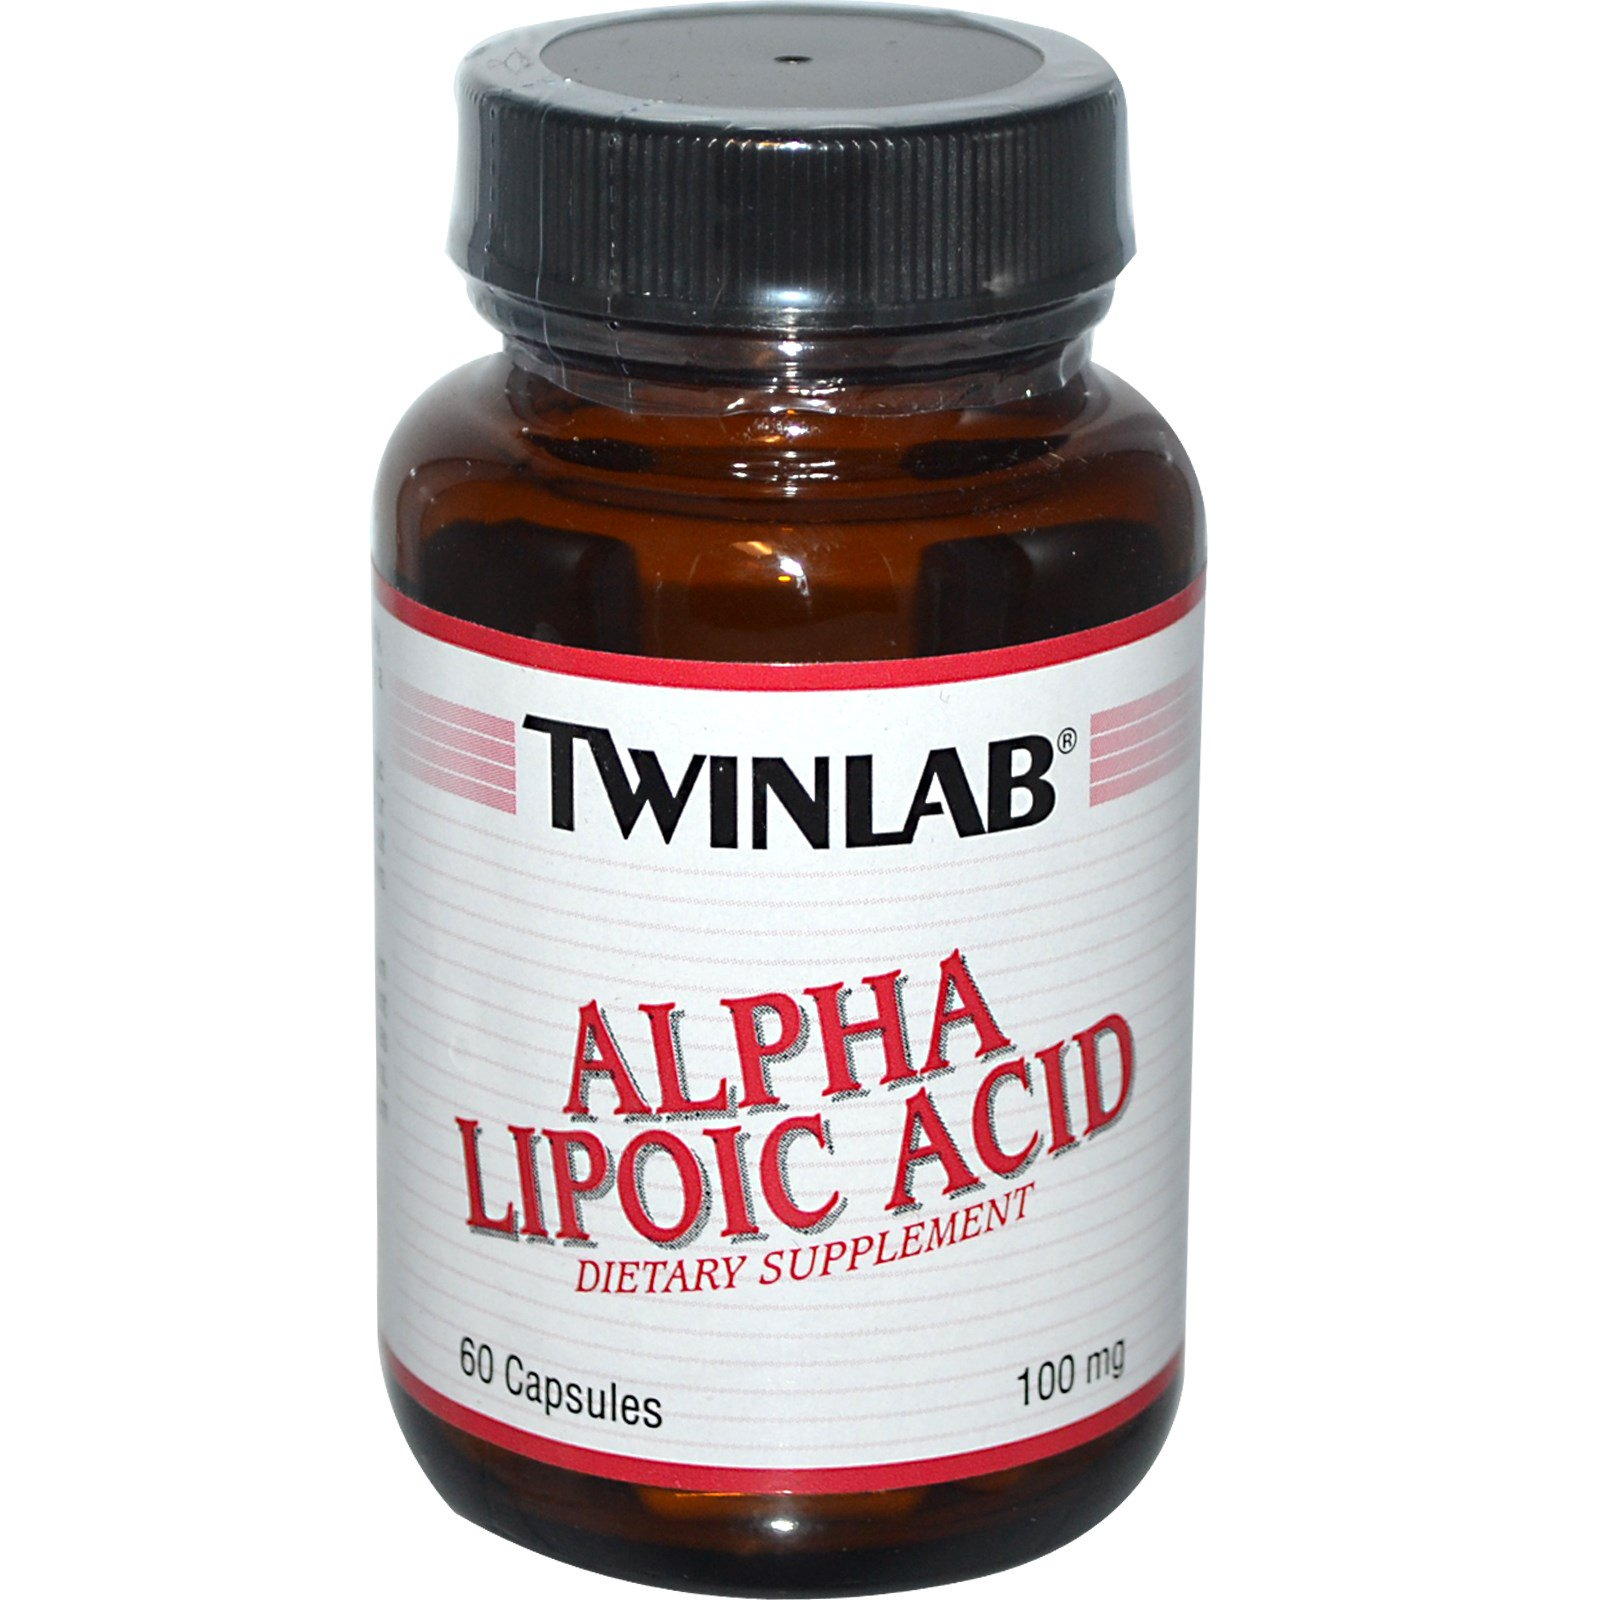 Twinlab, Альфа-липоевая кислота, 100 мг, 60 капсул